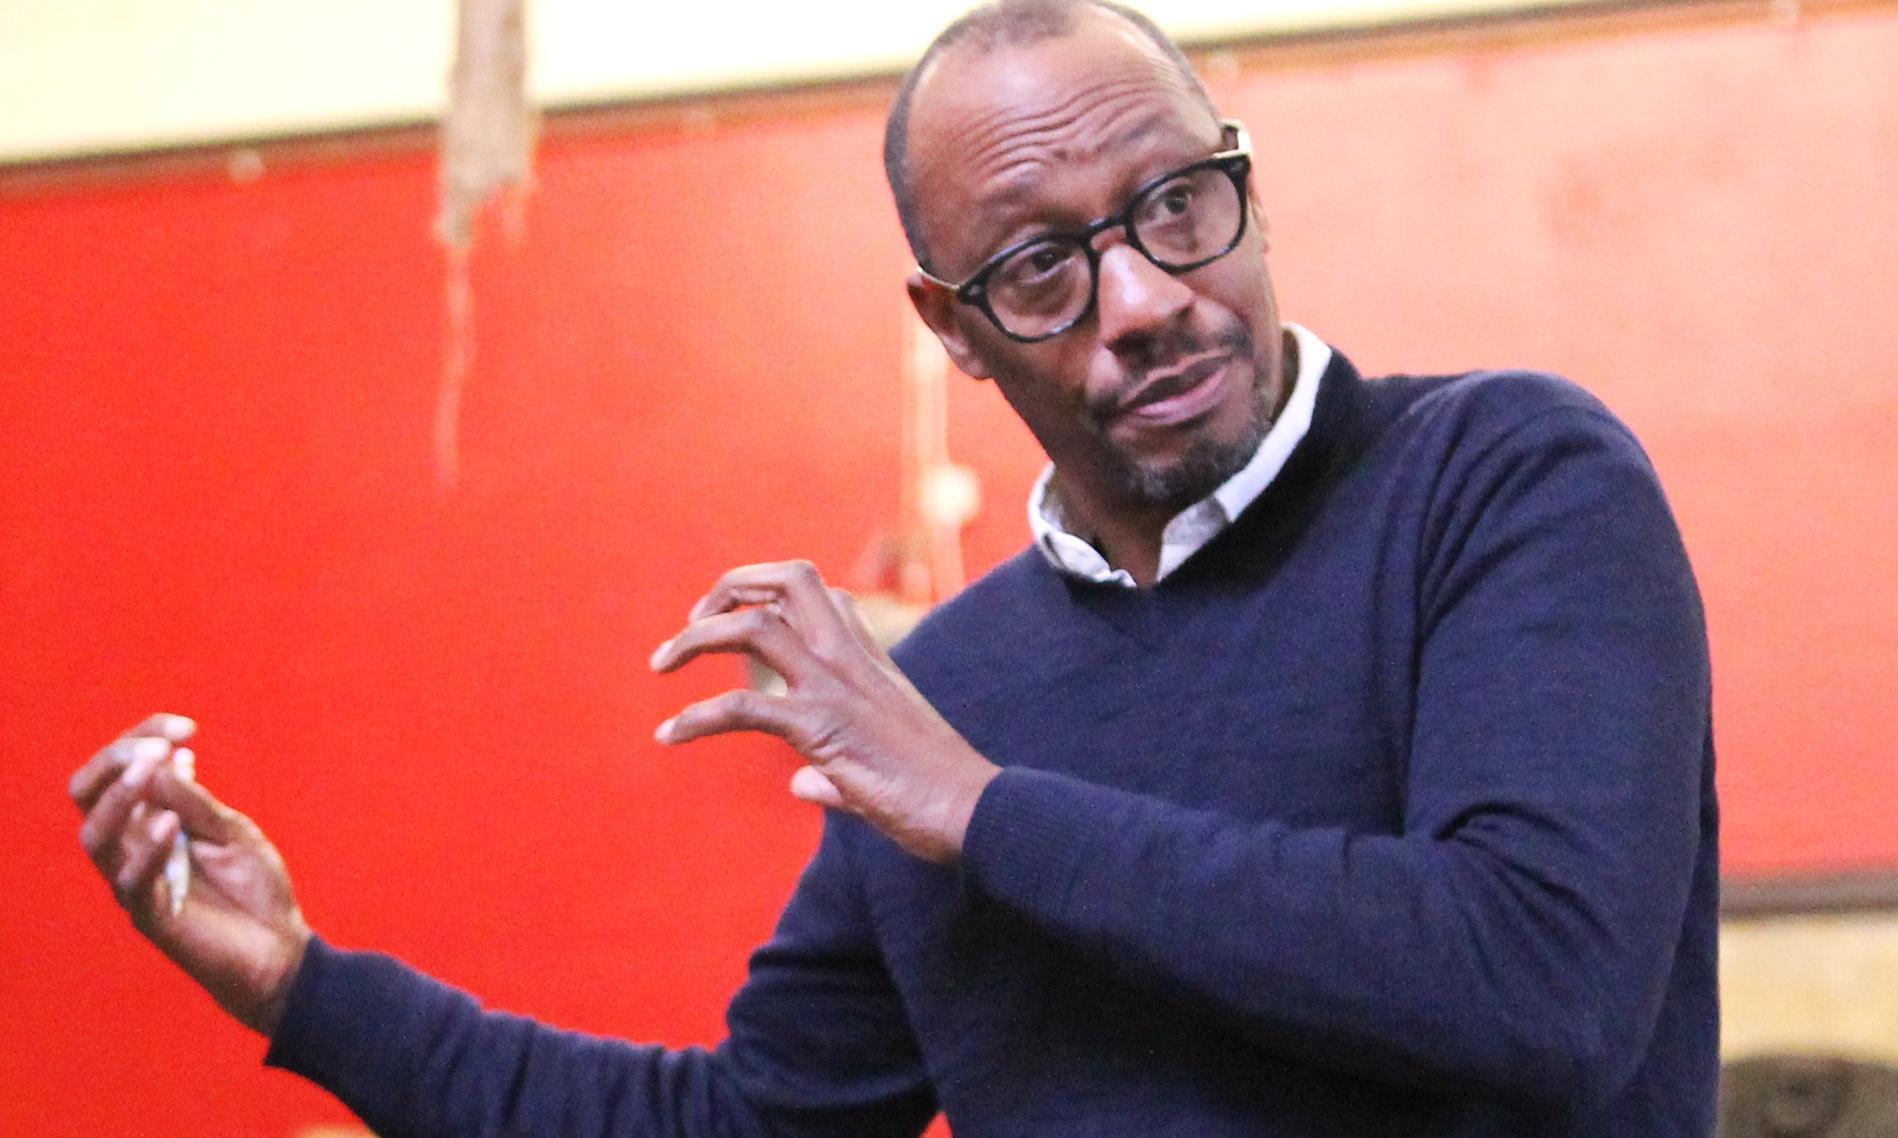 Head of Talawa theatre company criticises lack of diversity in arts